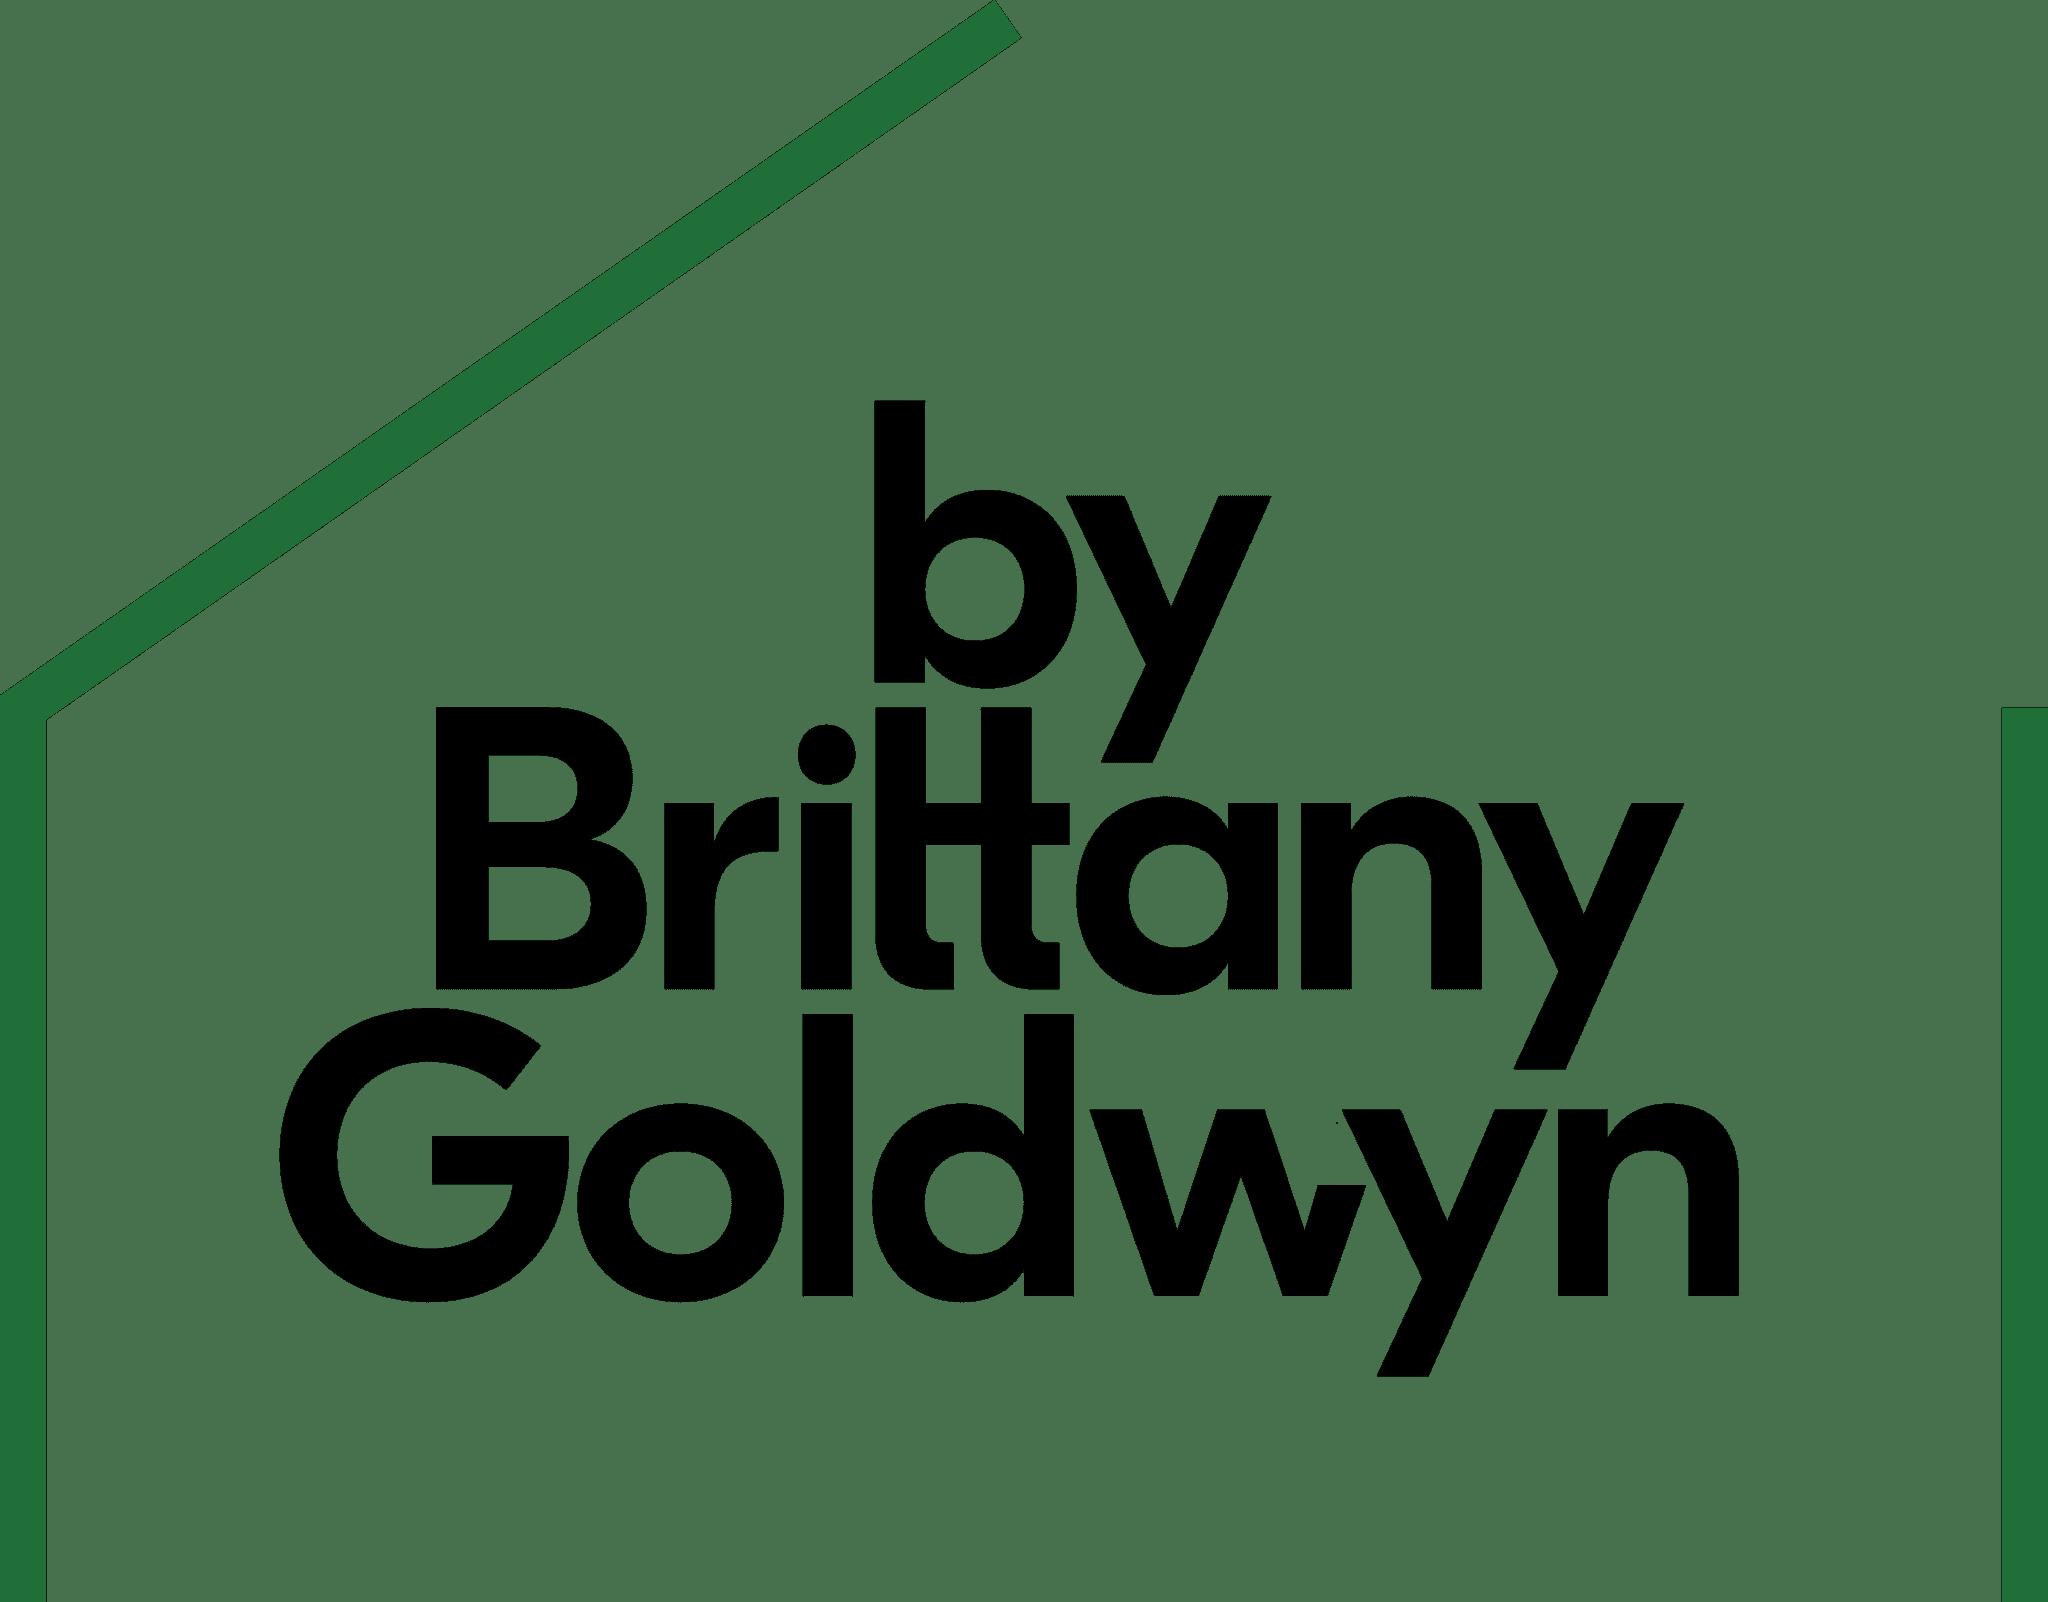 By Brittany Goldwyn | Live Creatively